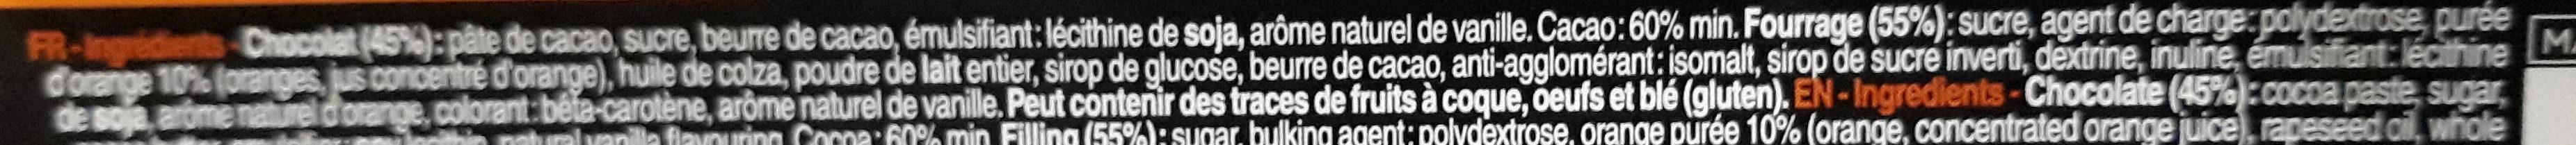 Bâton Galler Orange-Noir - Ingrediënten - fr